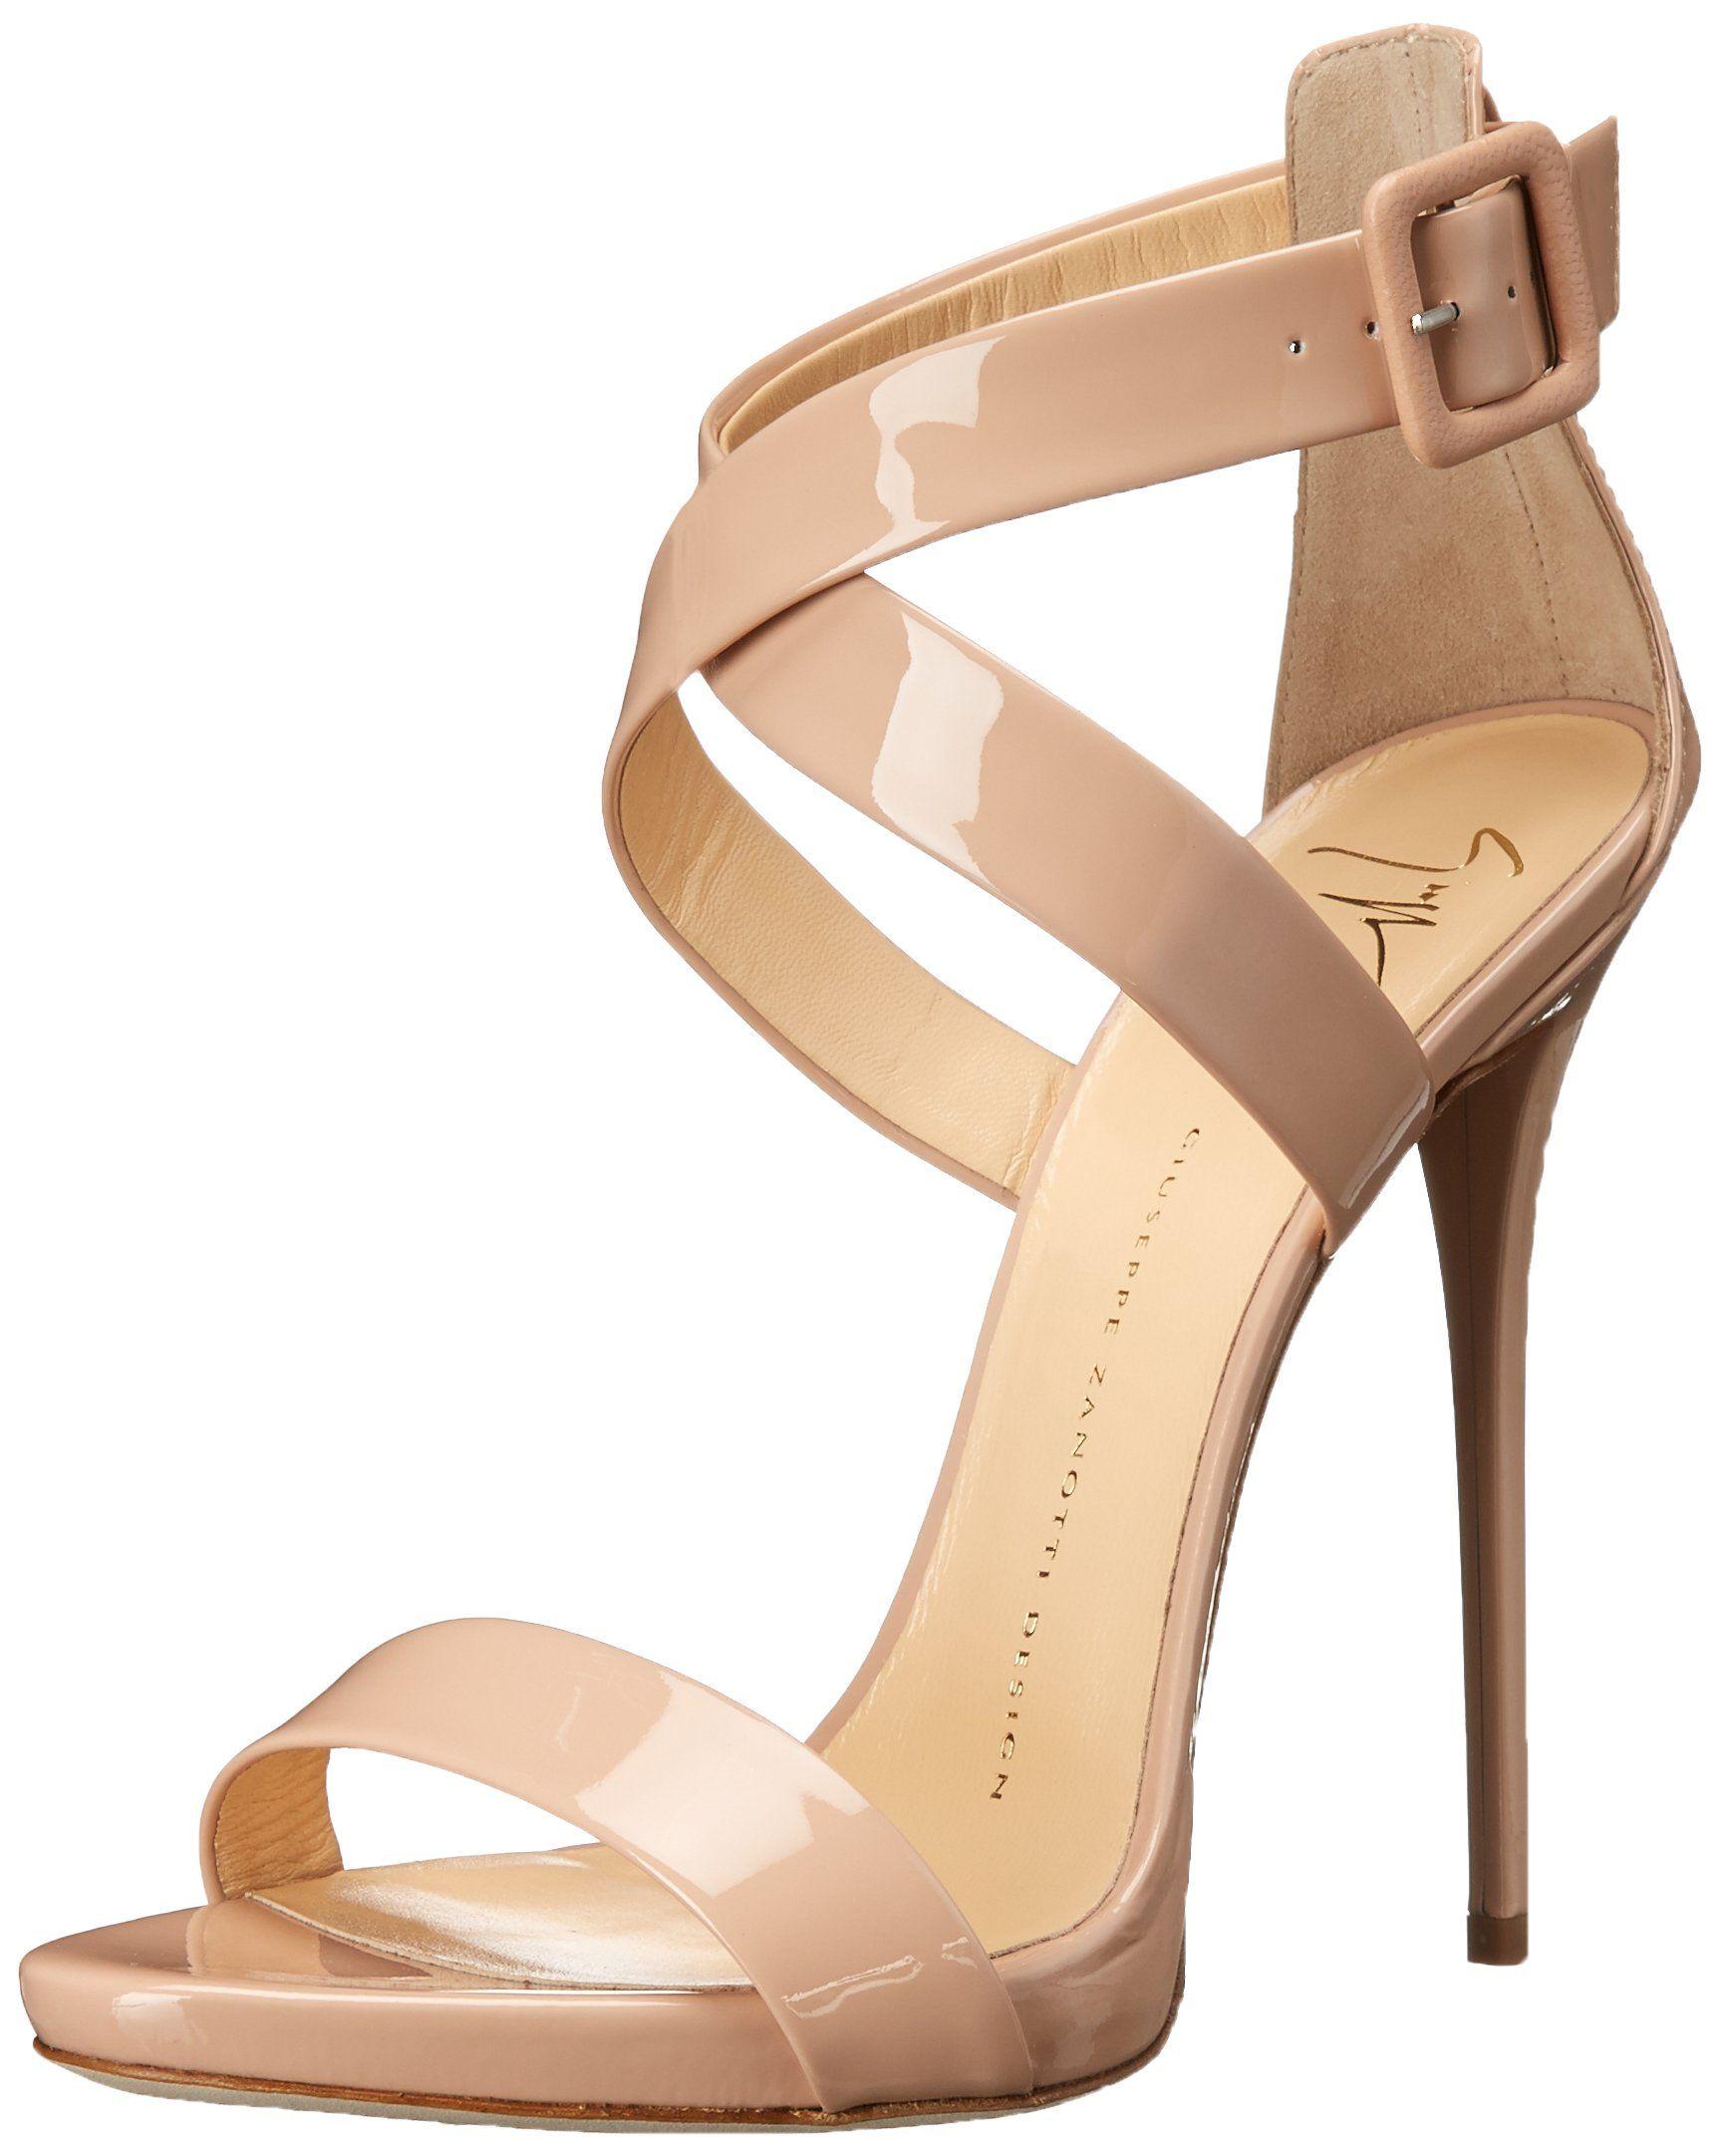 43612f01d1649 Giuseppe Zanotti Women s Cross Strap Dress Sandal